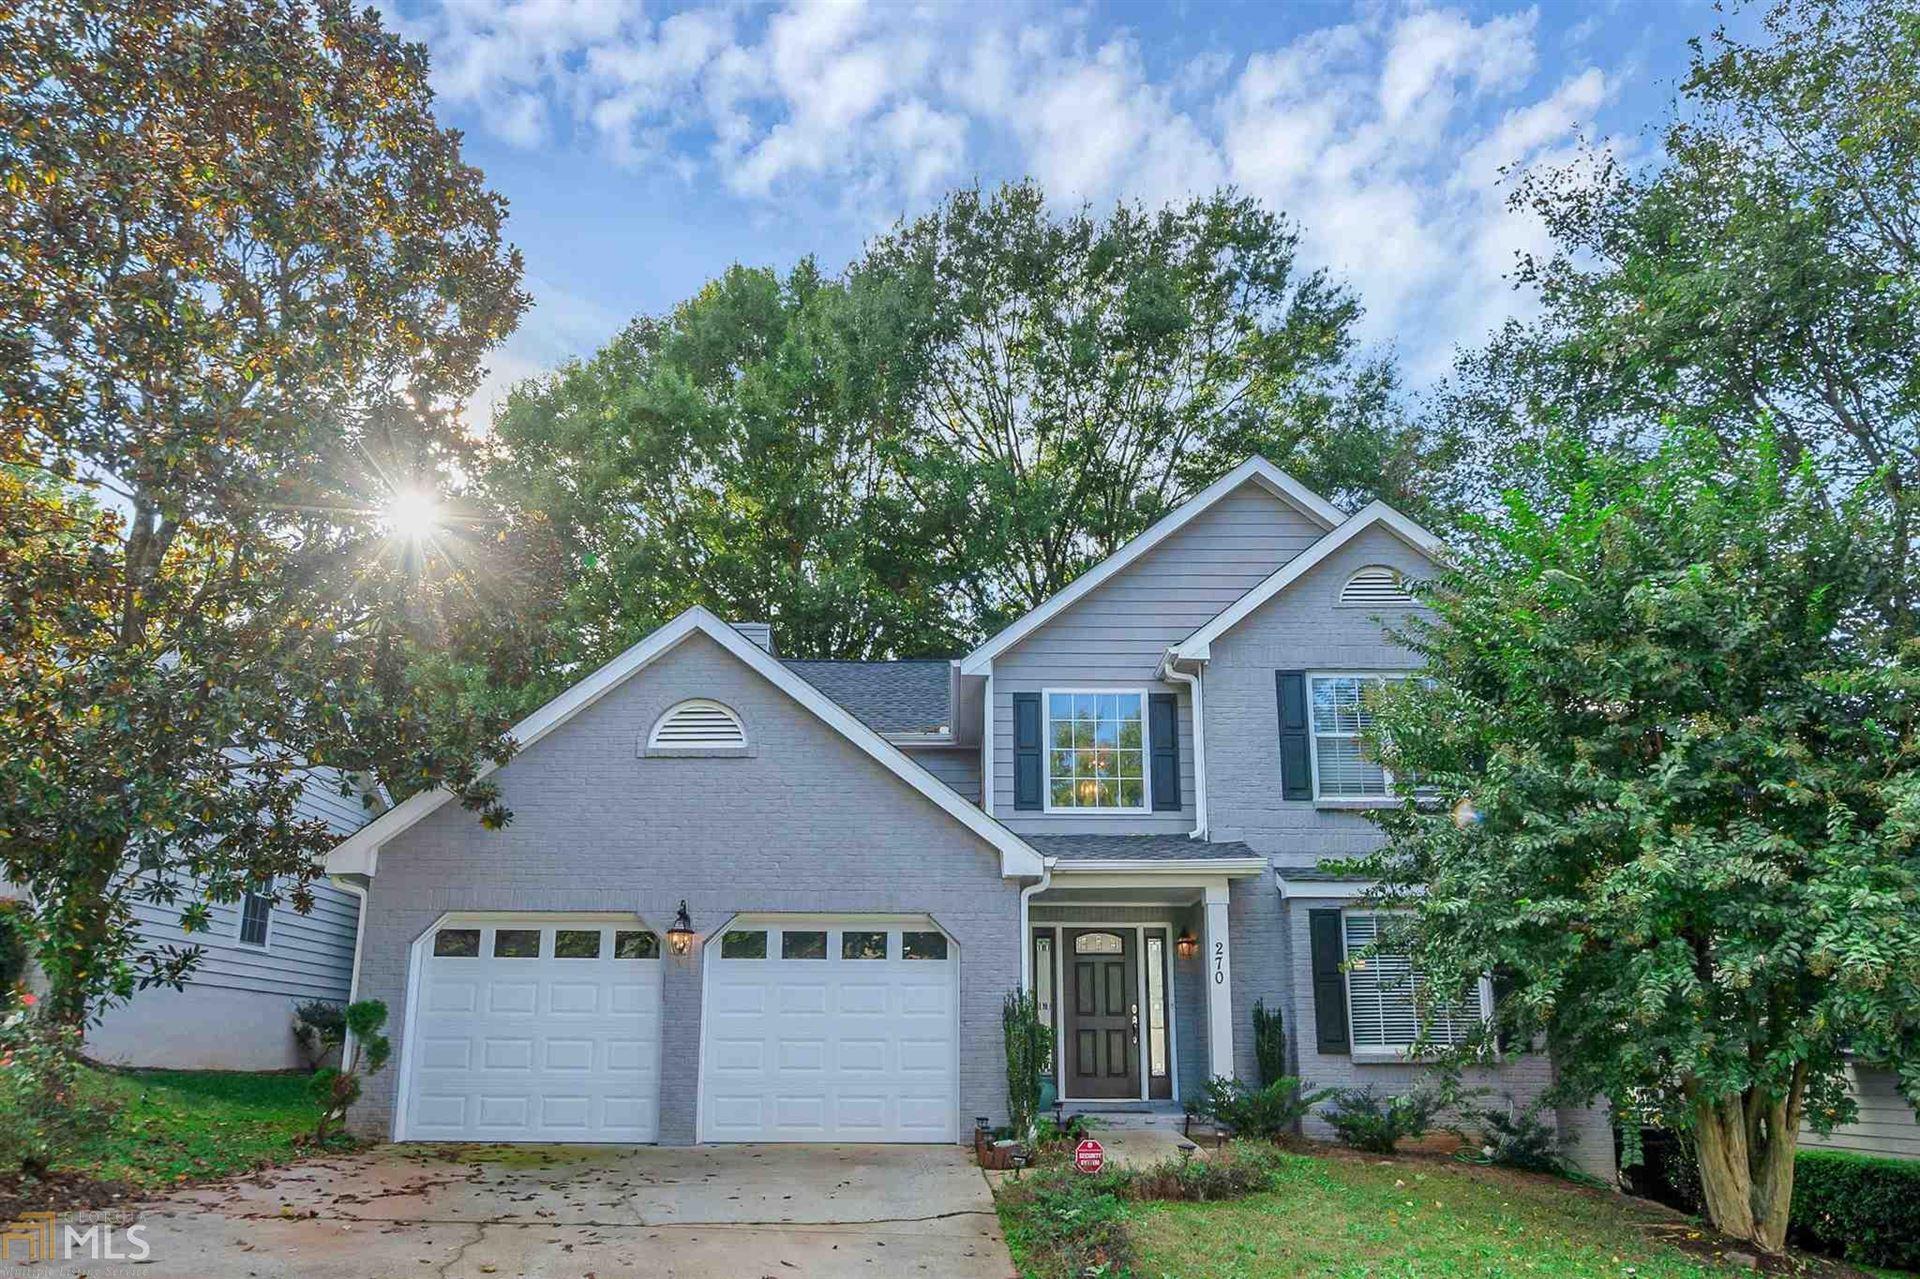 270 Glen Cove Dr, Avondale Estates, GA 30002 - MLS#: 8874321